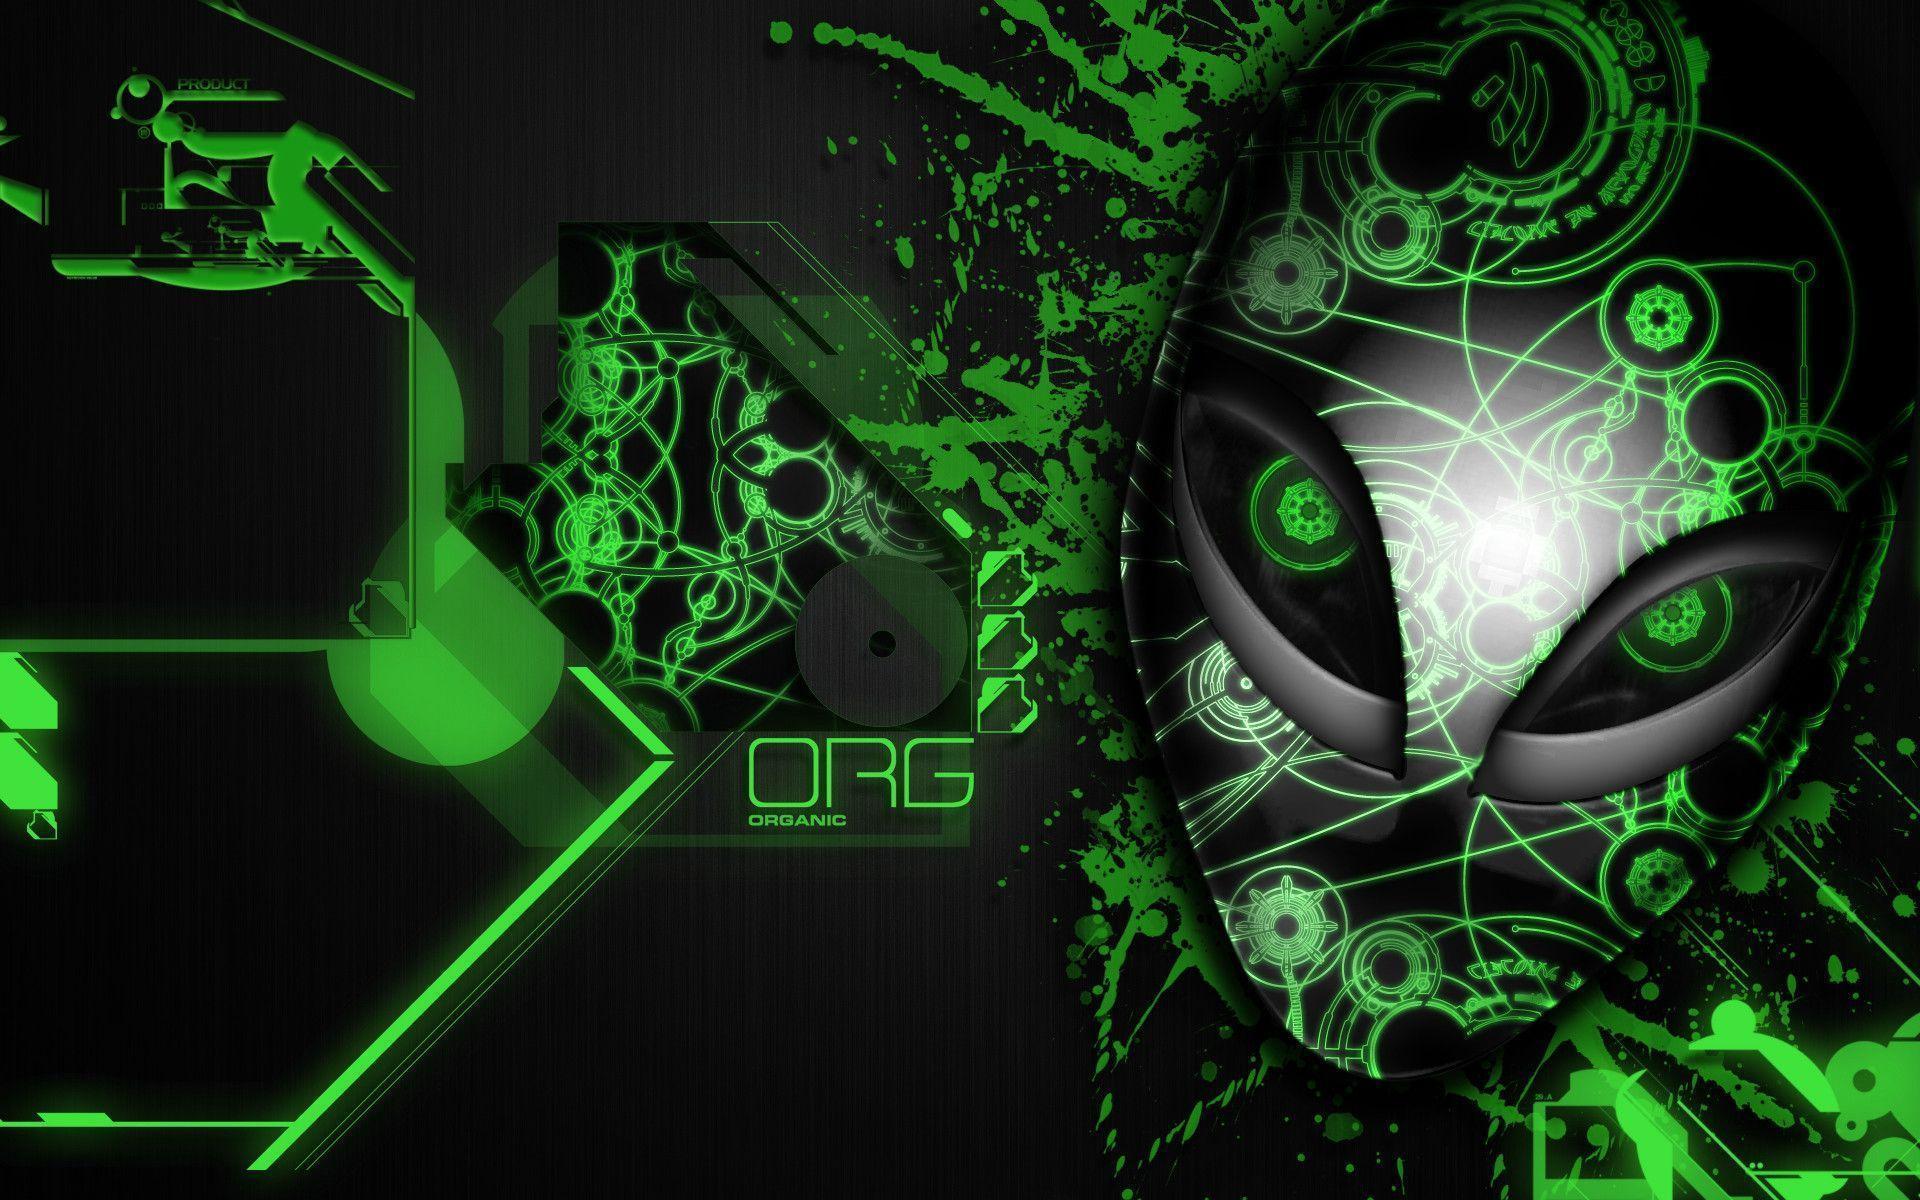 alienware wallpaper green hd - photo #23